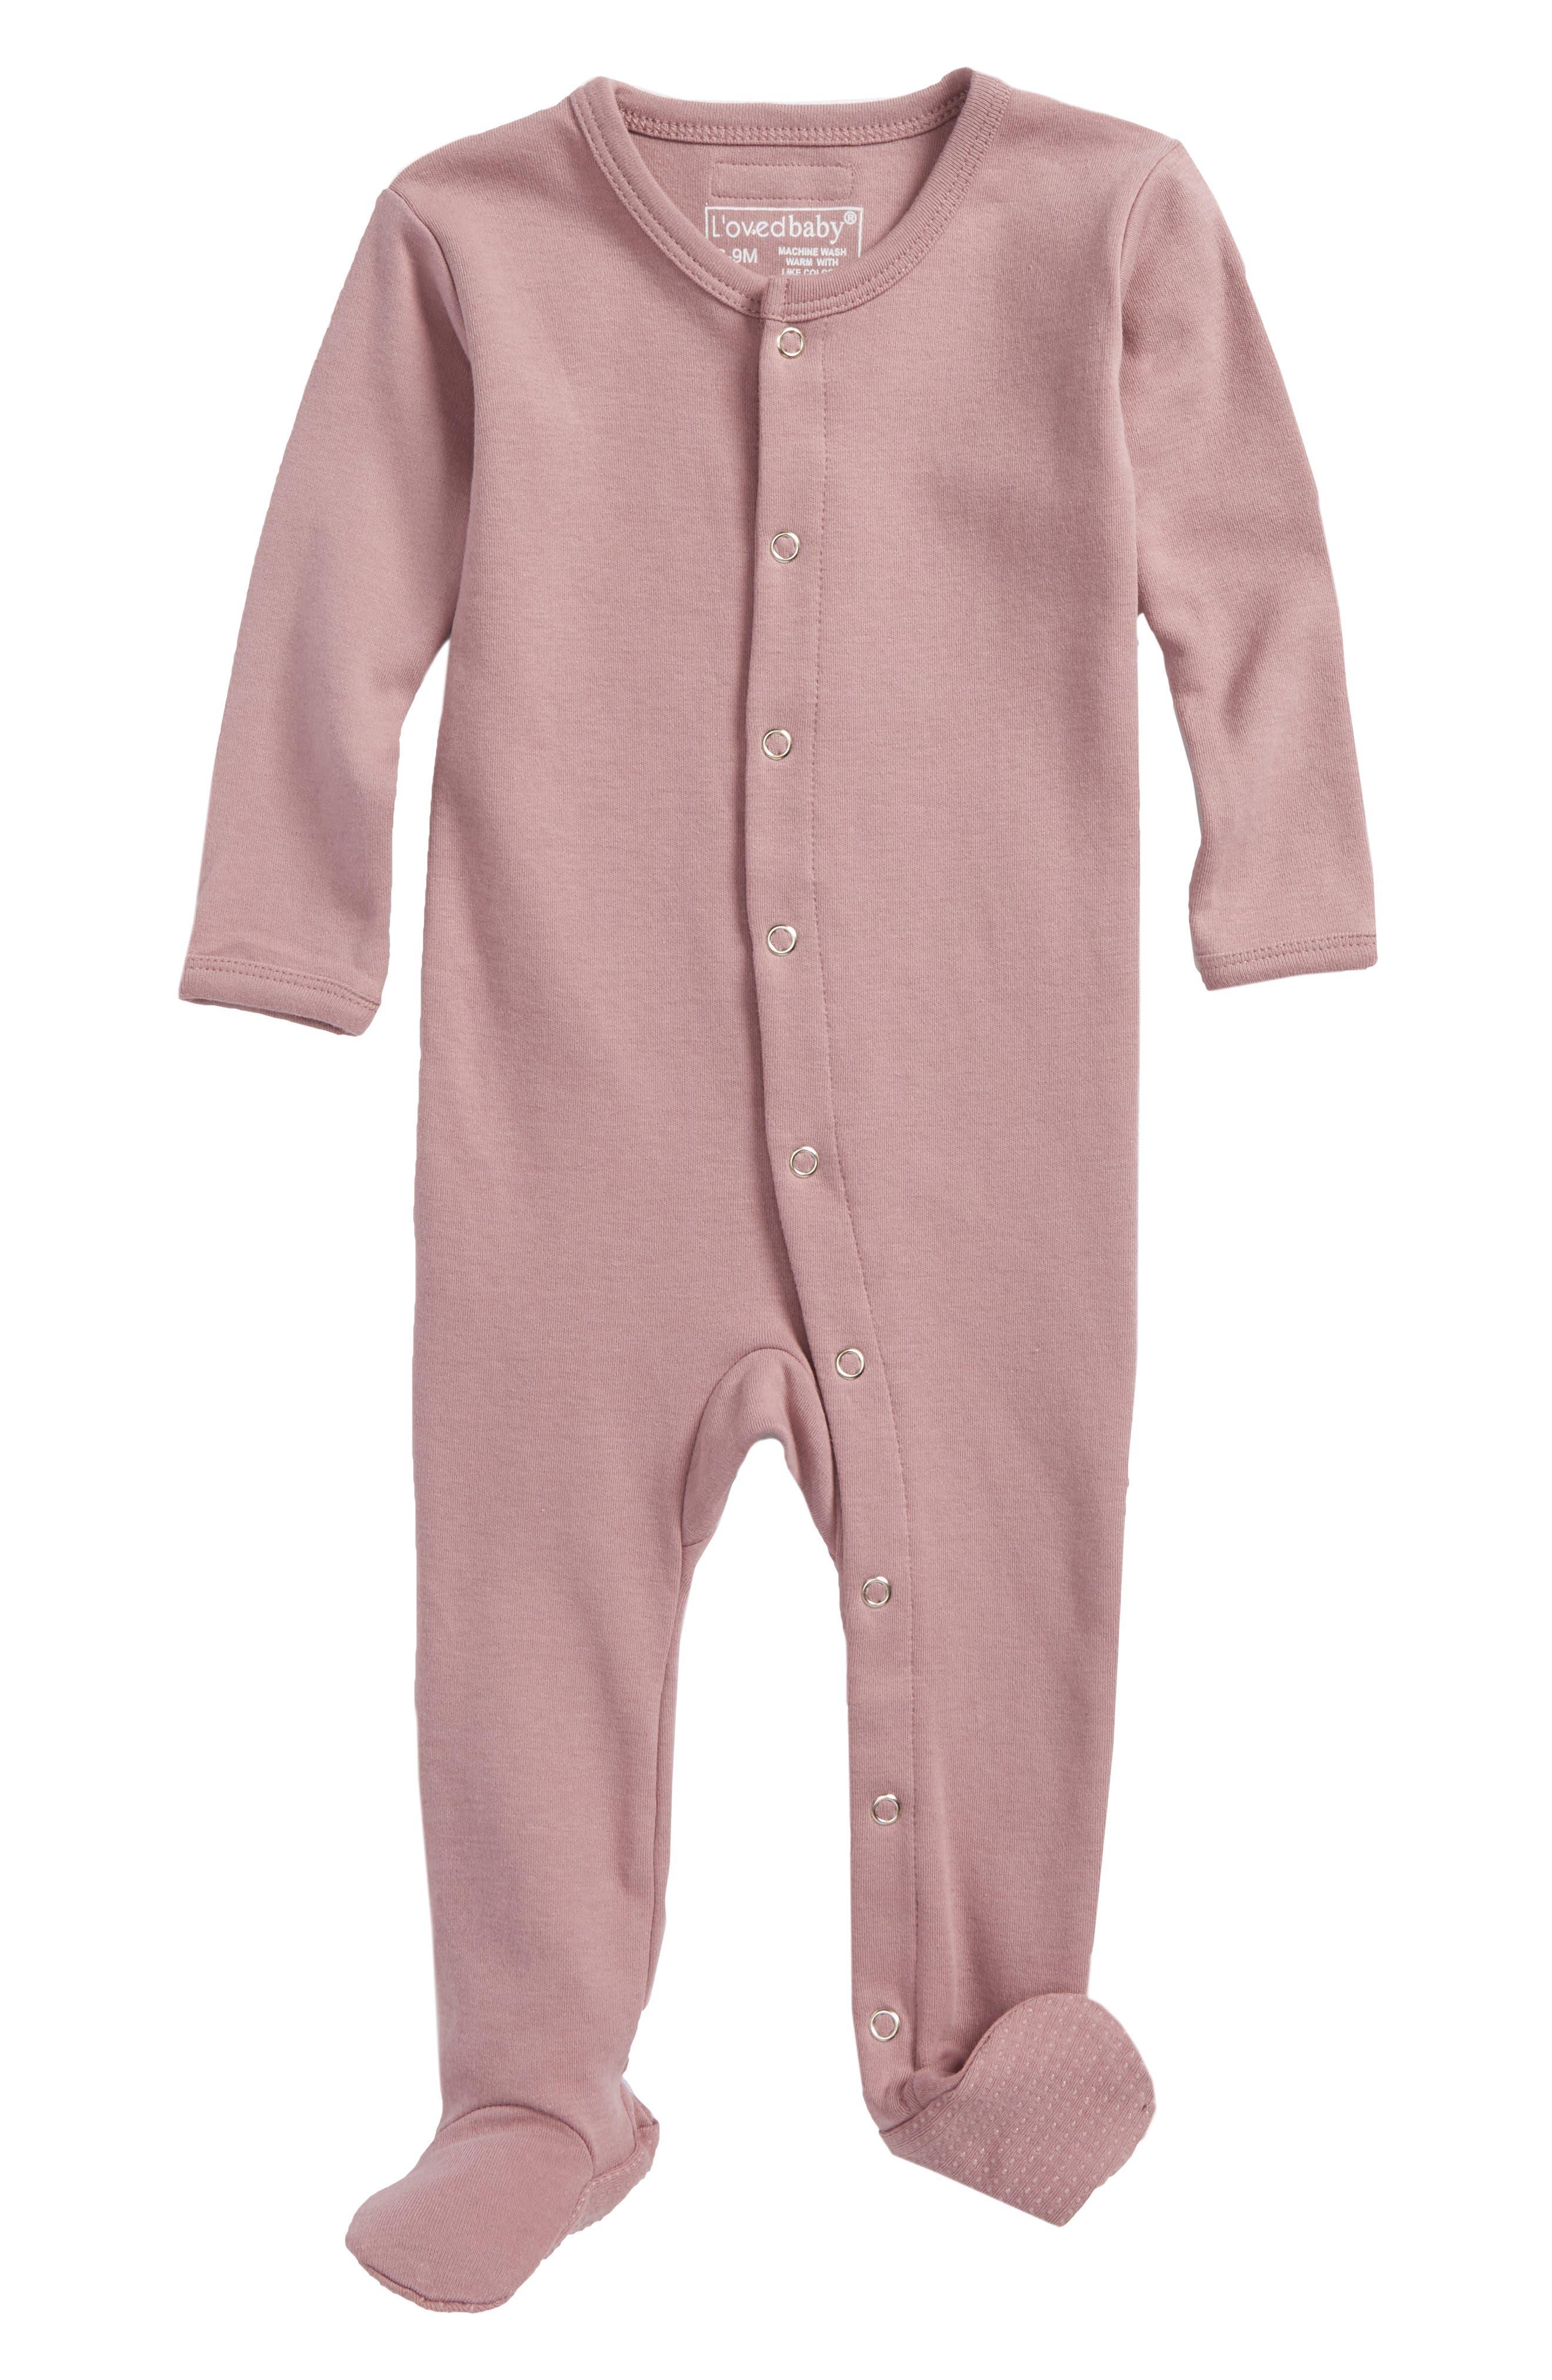 Baby Girls Purple Clothing Dresses Bodysuits & Footies